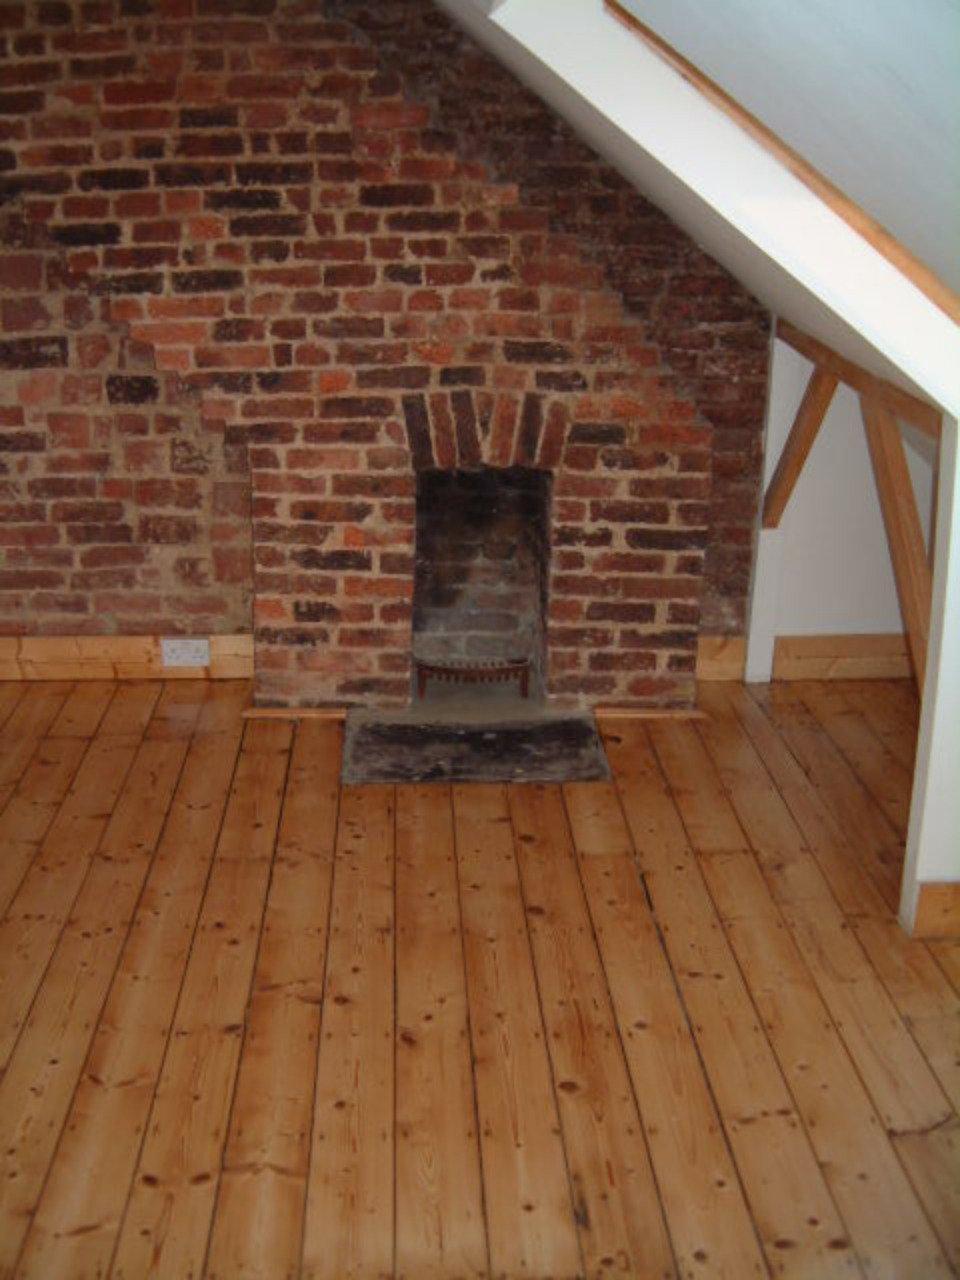 Types of Wood for Hardwood Floors